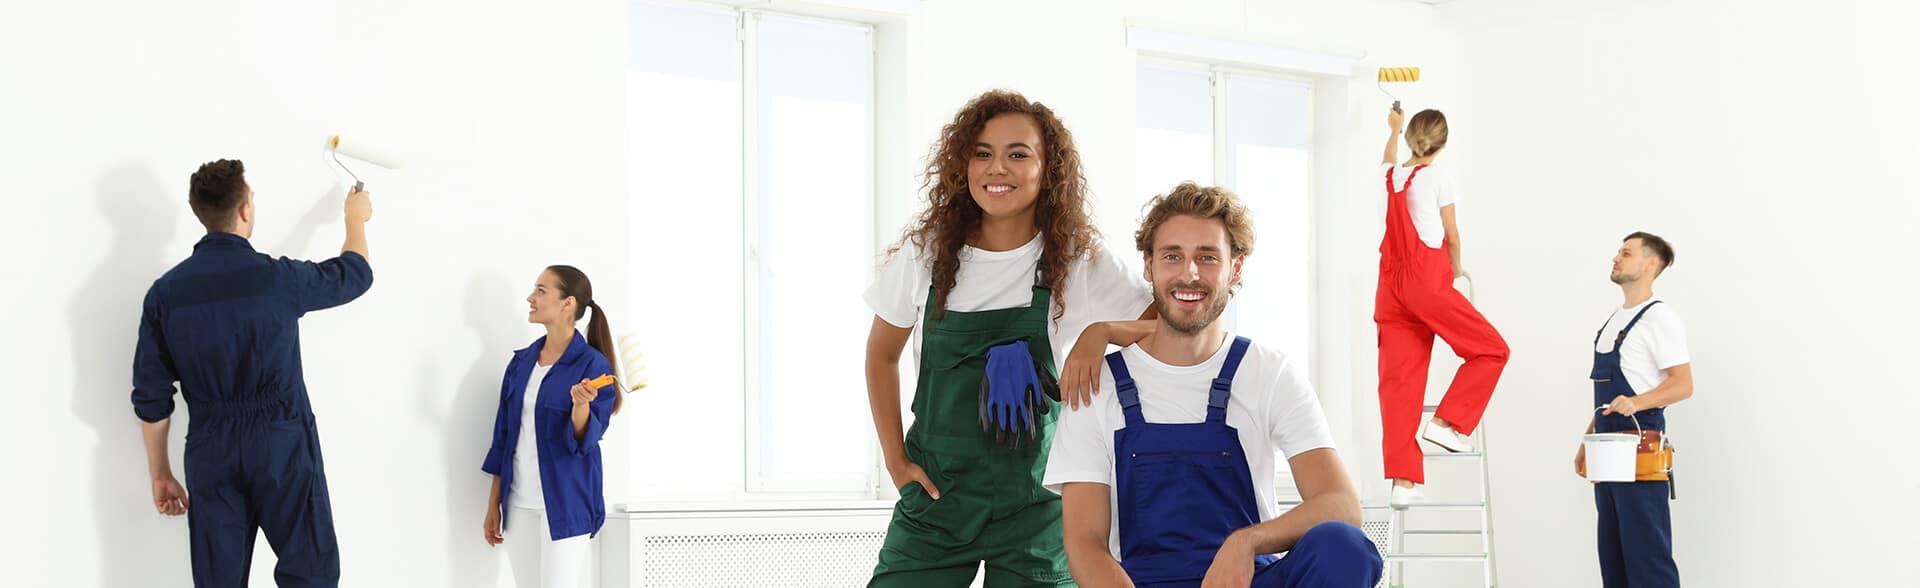 Team of professional painters working indoor